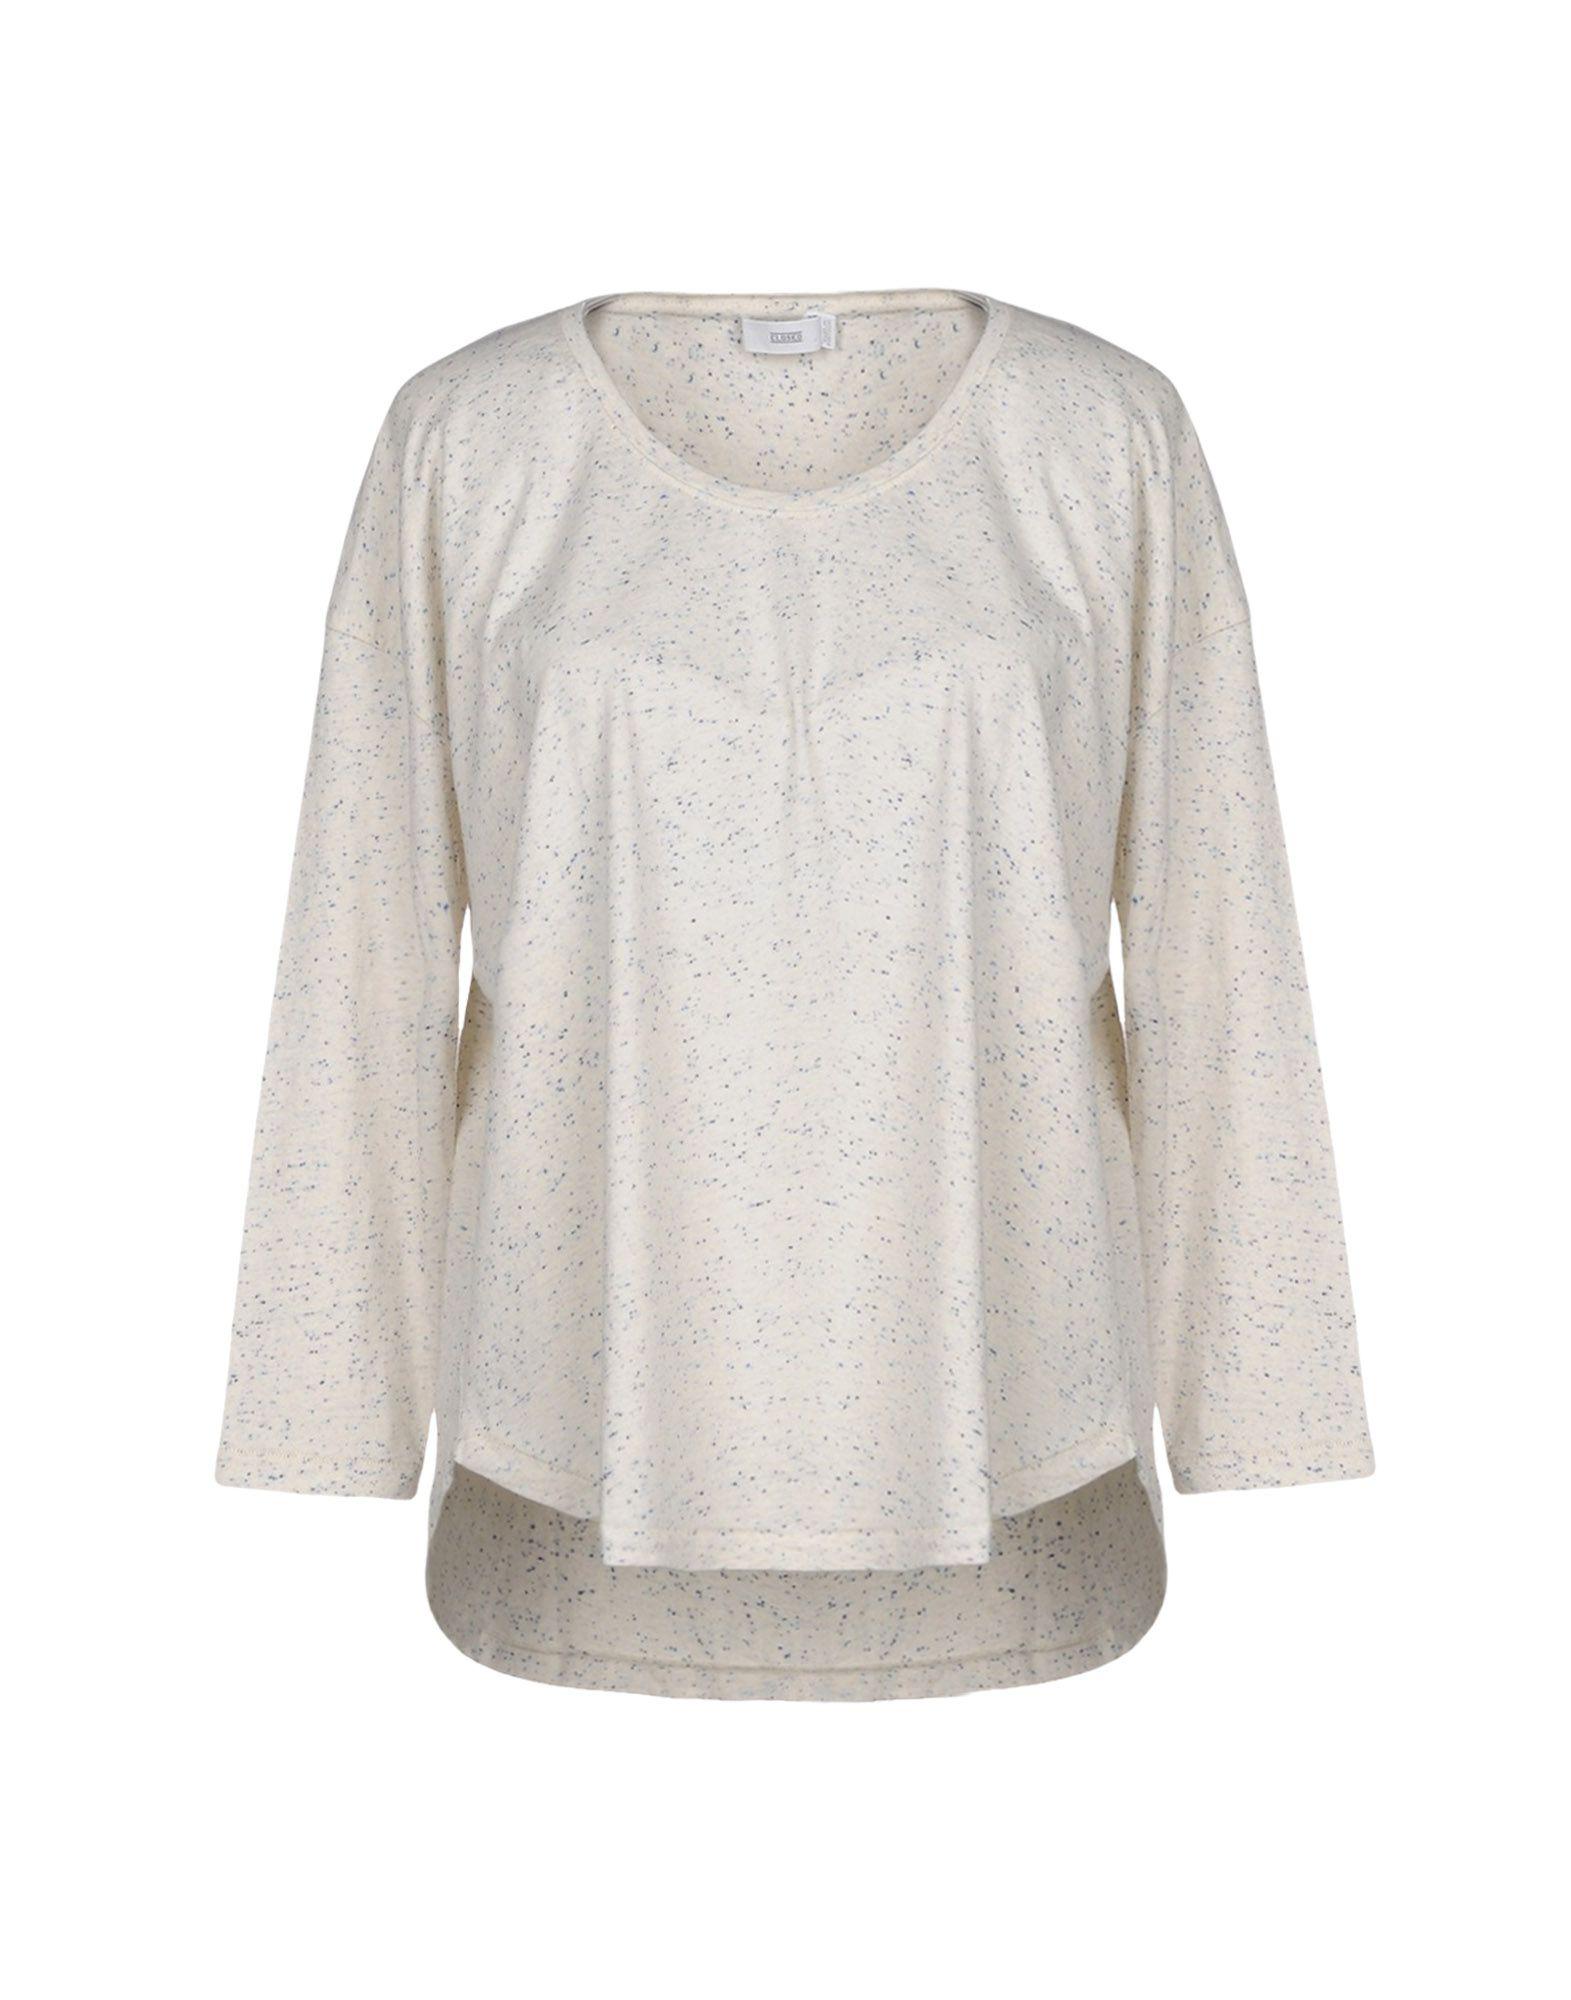 CLOSED Damen T-shirts Farbe Hellgrau Größe 3